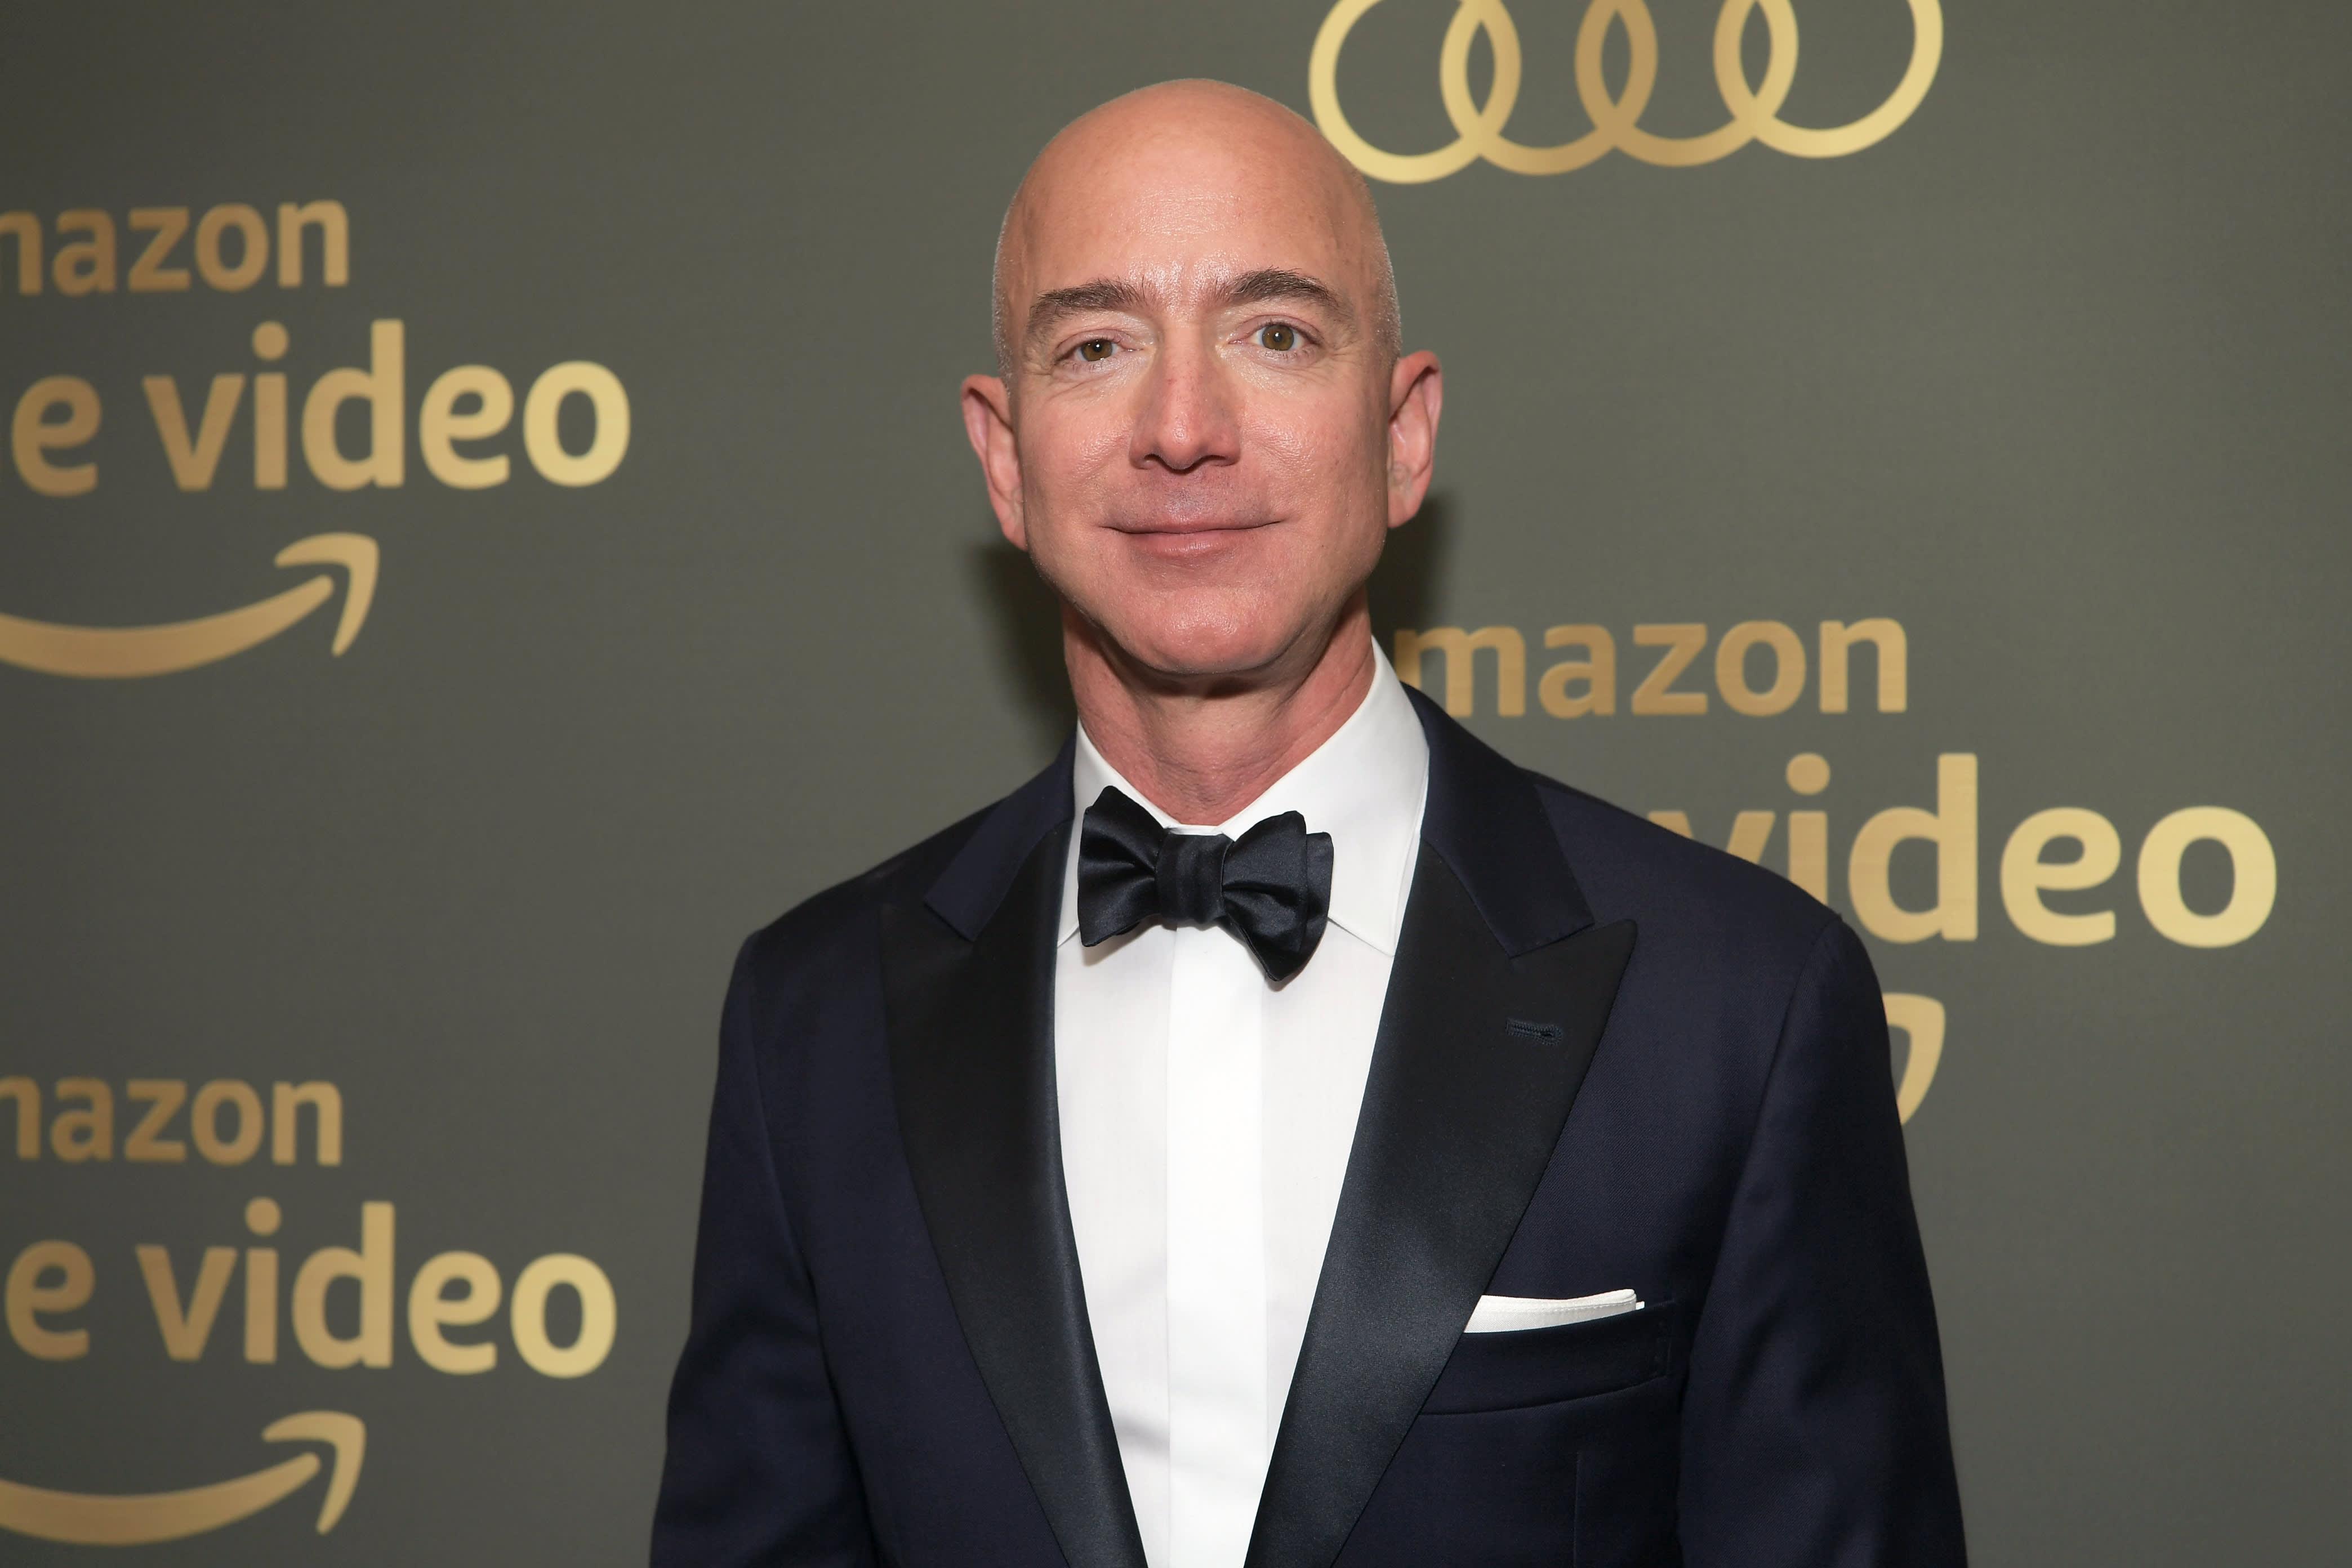 Exclusive: See inside Amazon CEO Jeff Bezos' new $80 million NYC mega-home